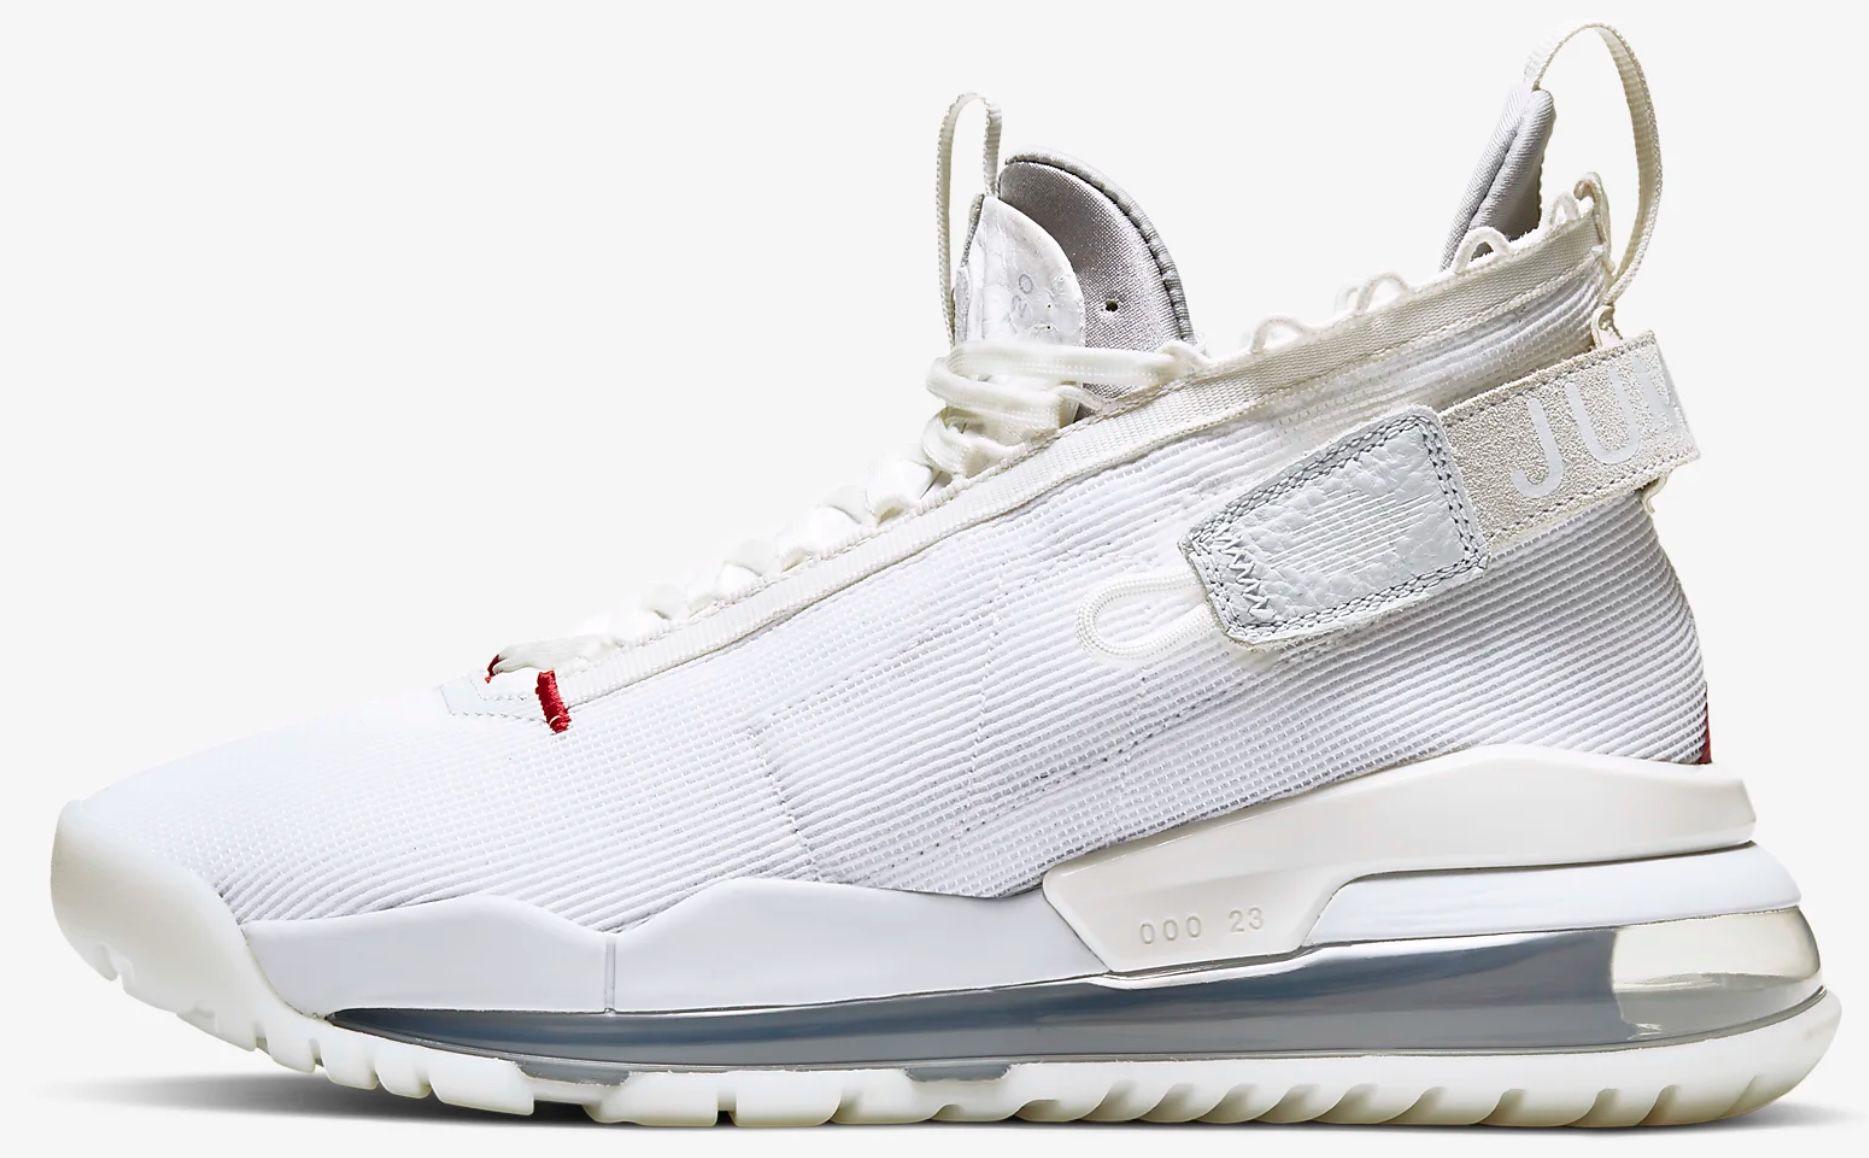 Für Sammler: Nike Jordan Proto Max 720 für 104,38€ (statt 200€)